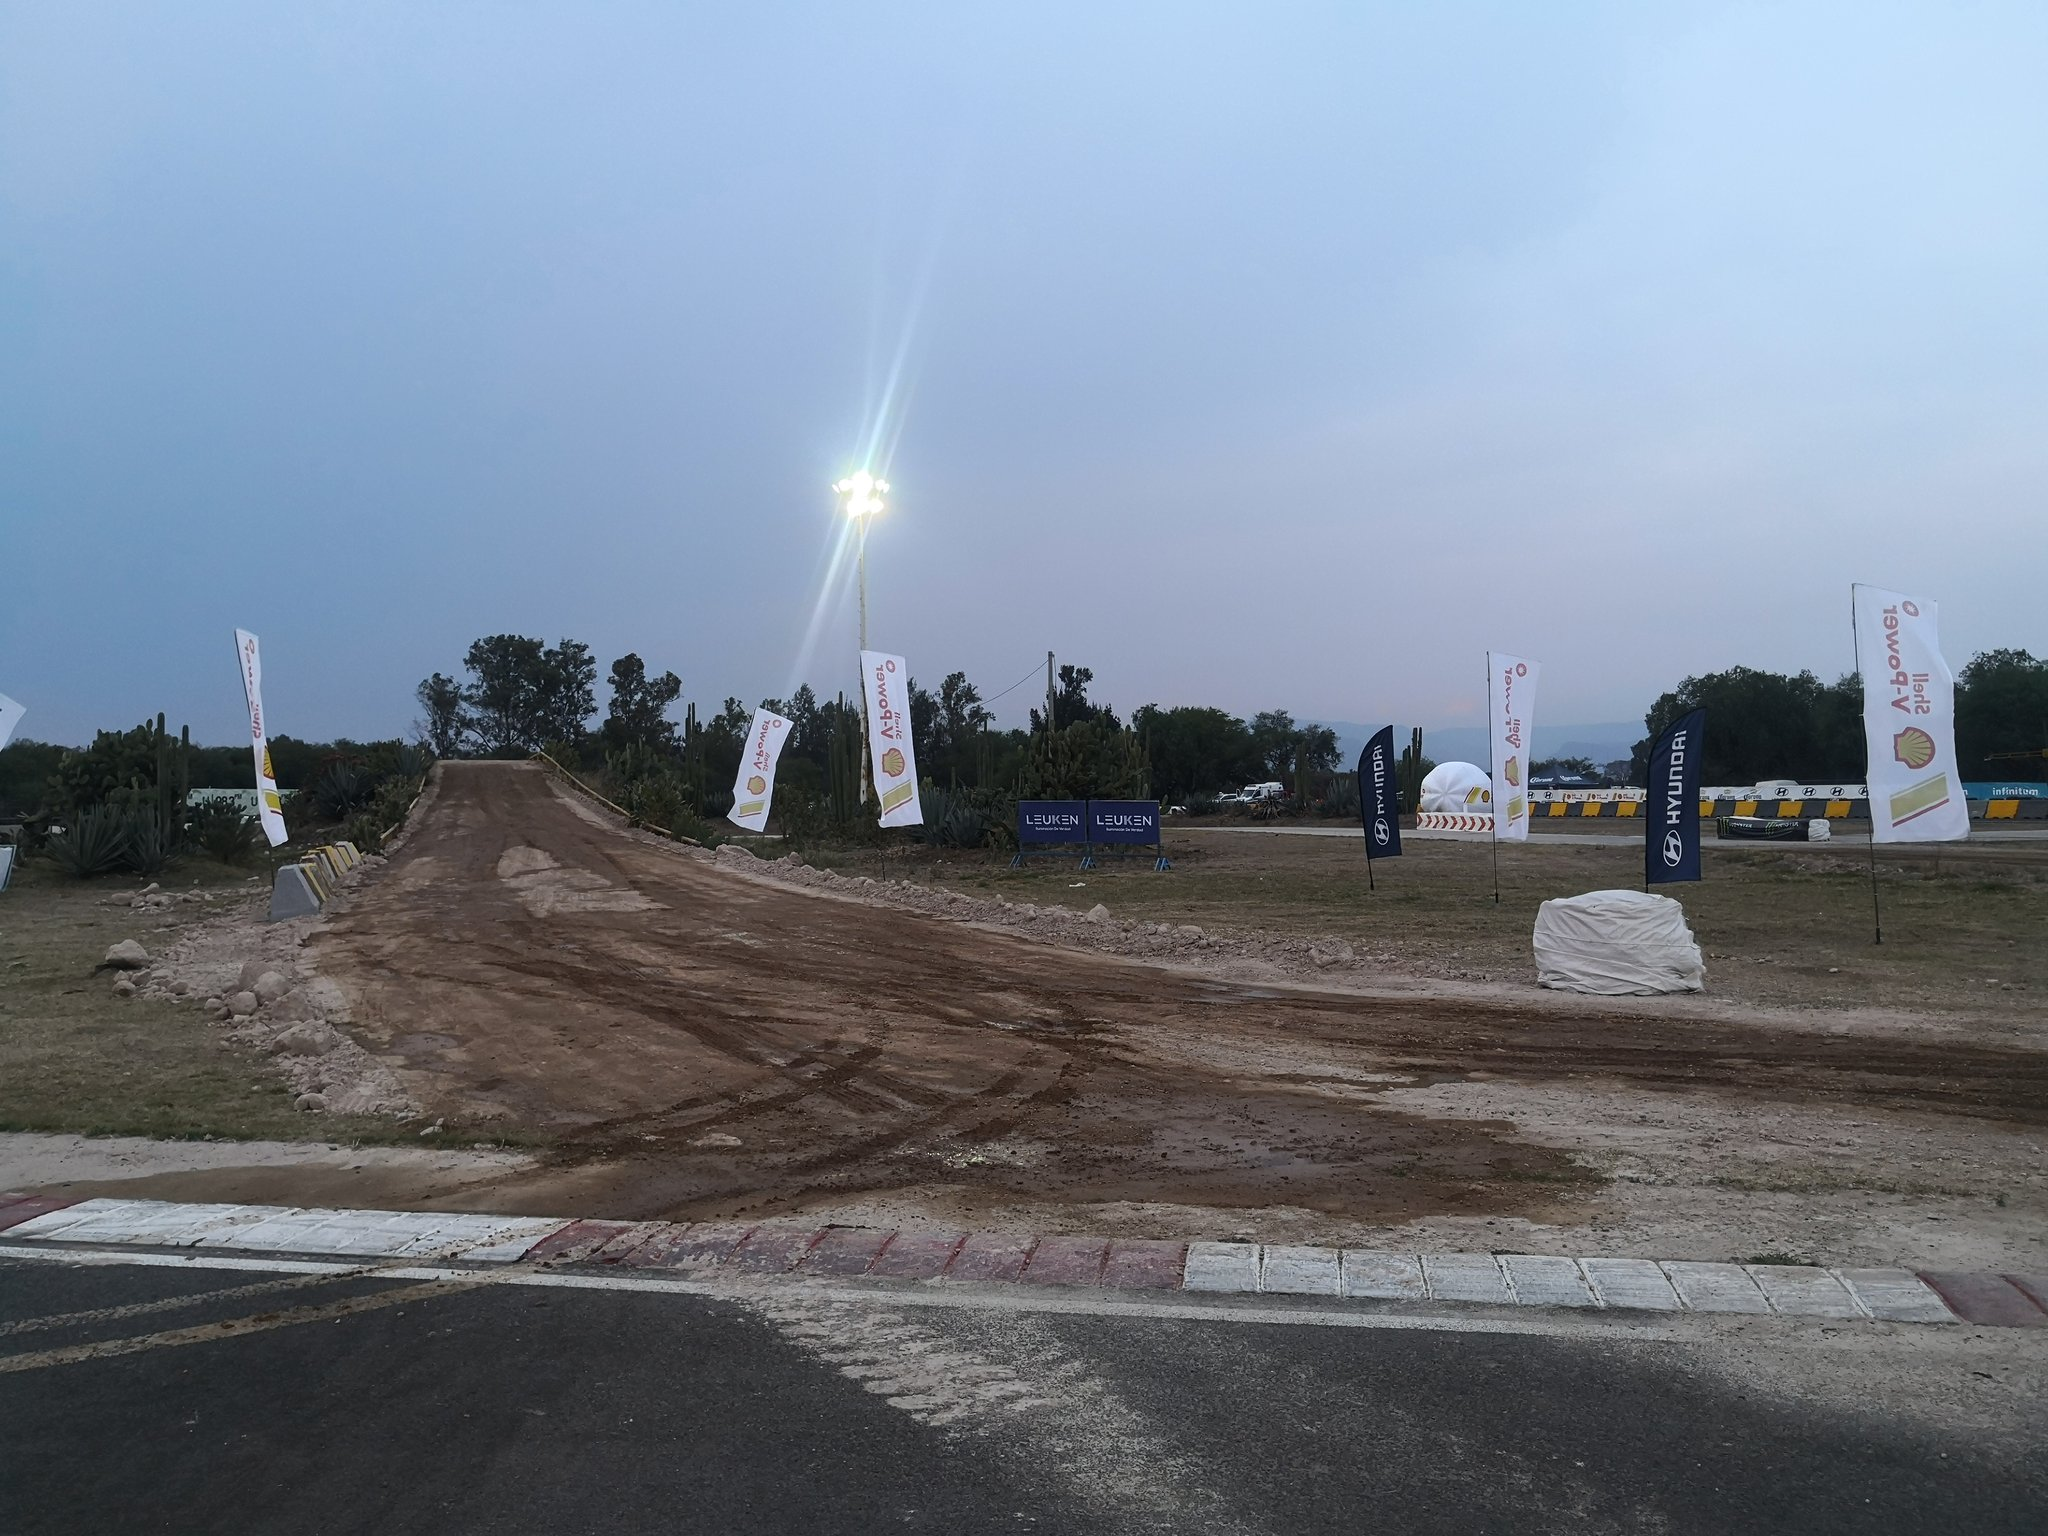 WRC: 17º Rallye Guanajuato Corona - México [12-15 Marzo] - Página 4 ETB_A_fXkAA_YO_?format=jpg&name=large